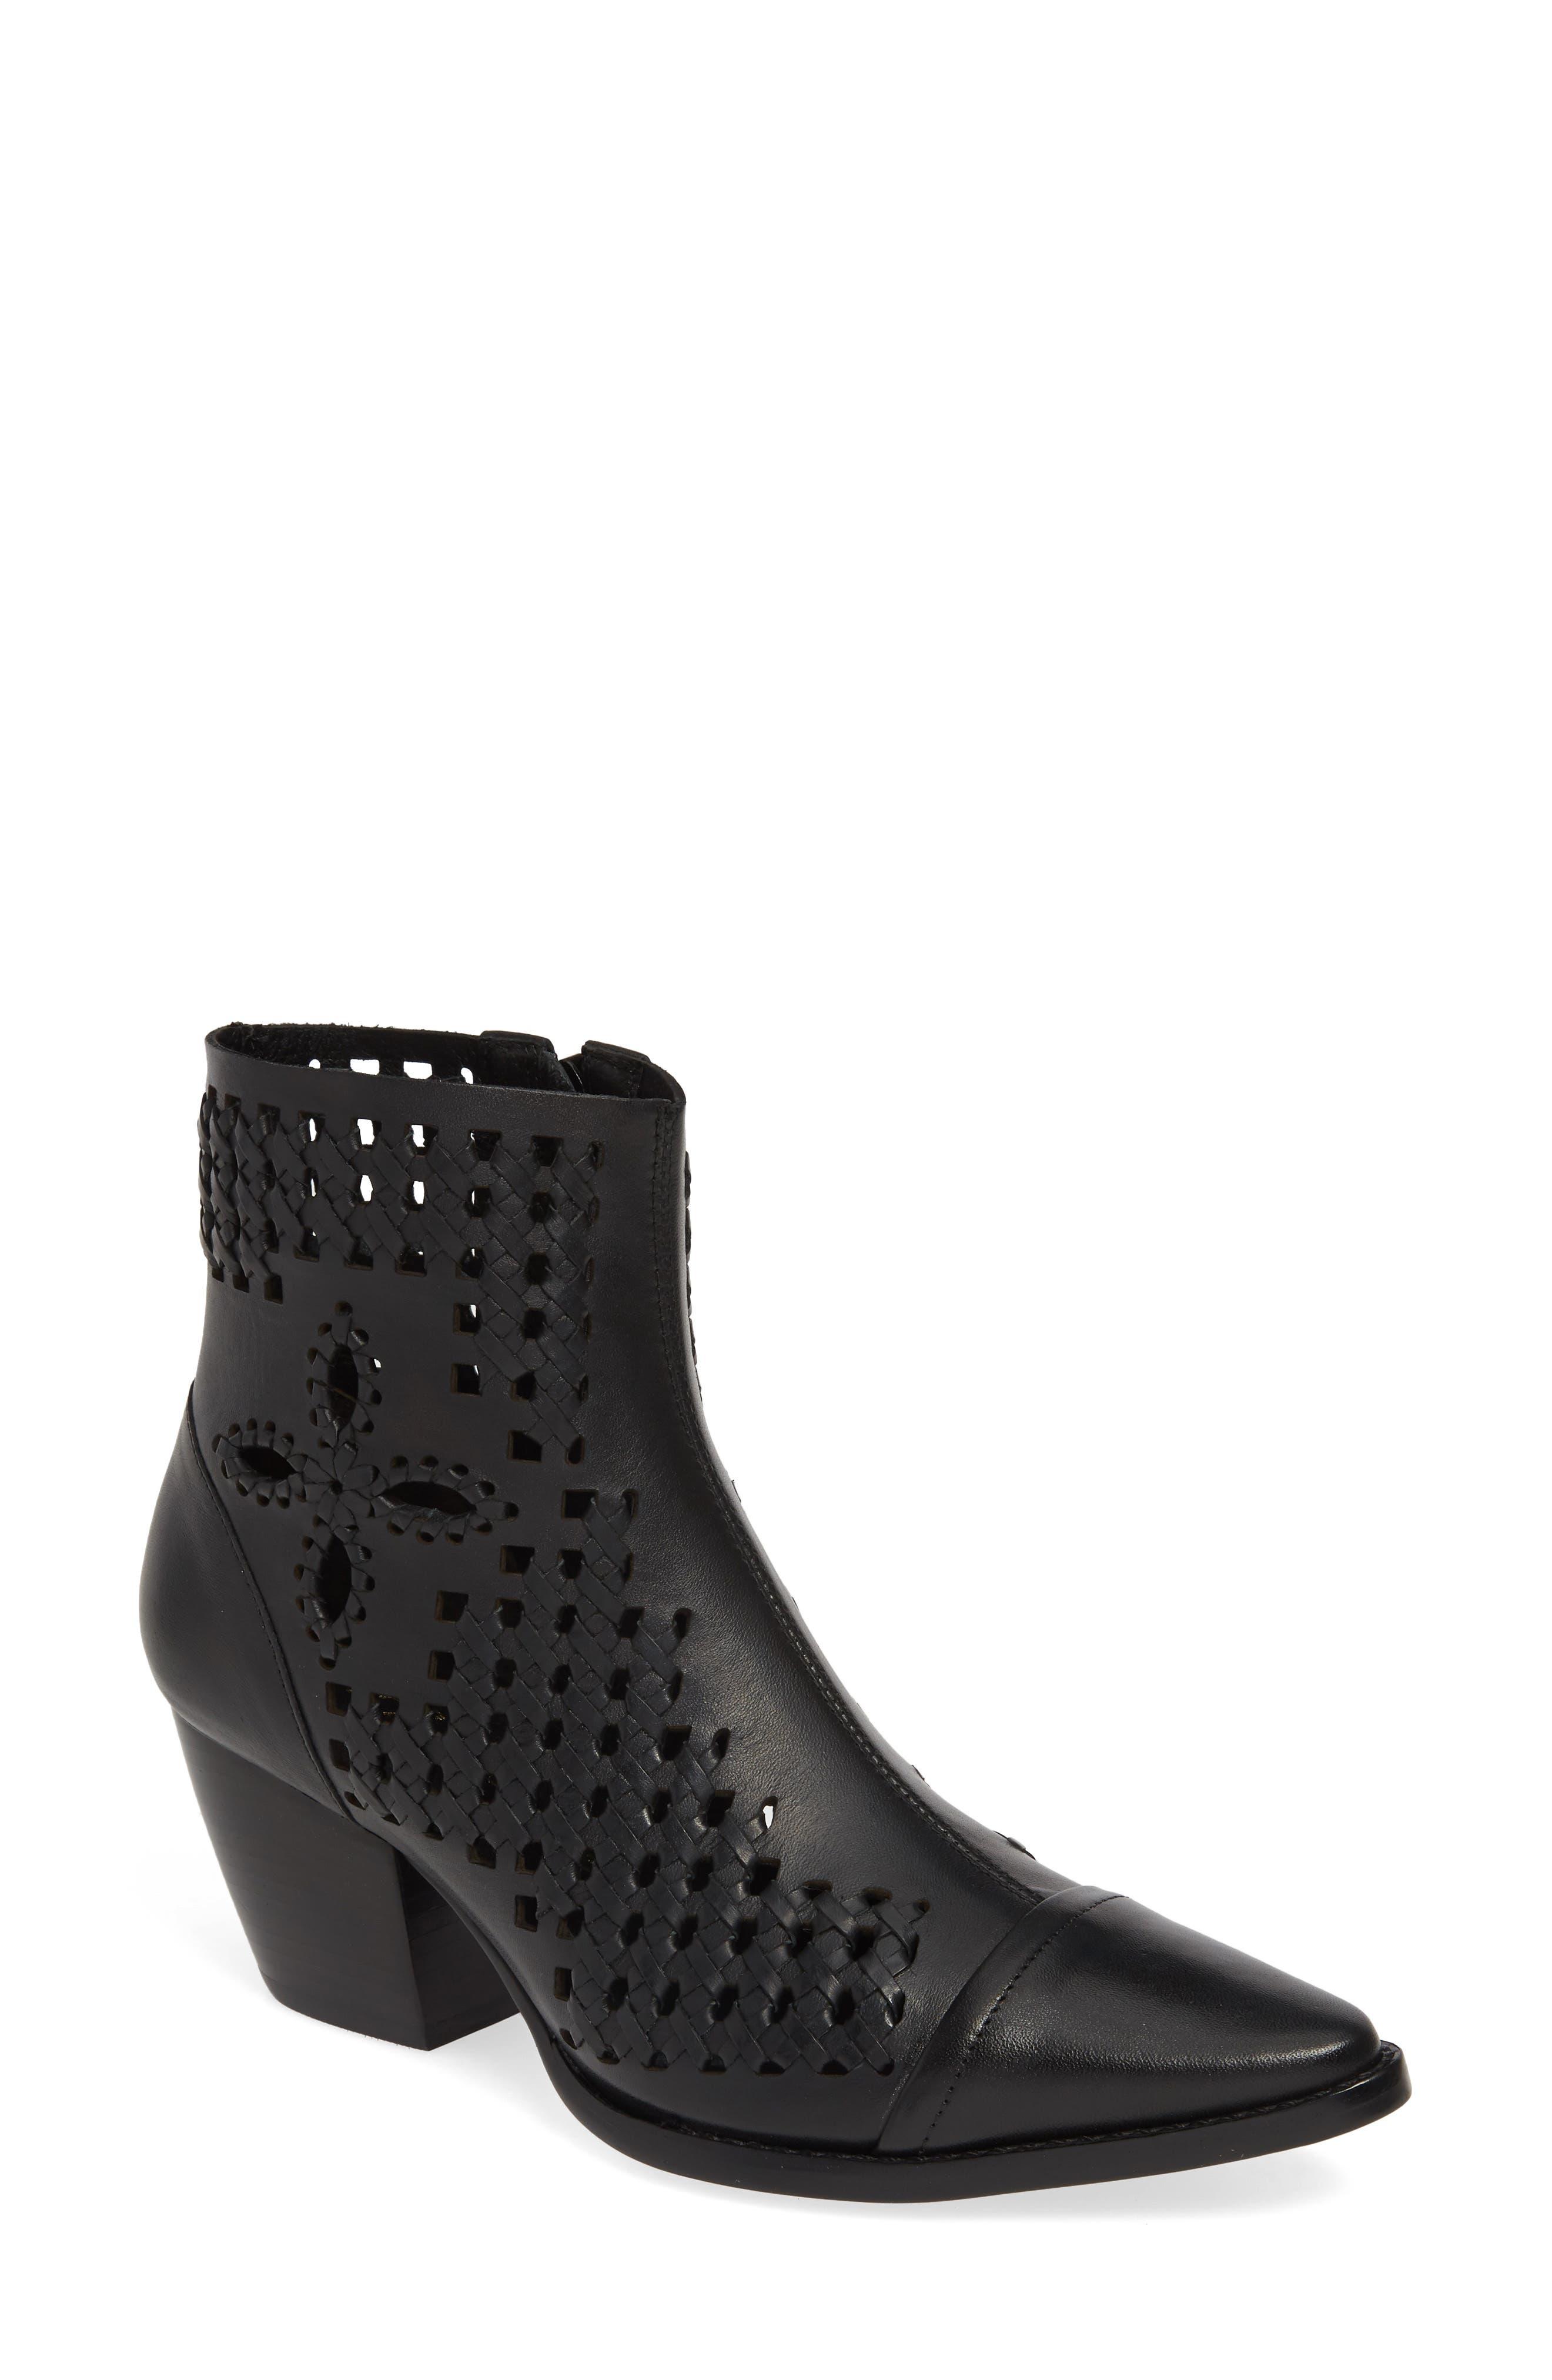 Matisse Bello Woven Pointy Toe Bootie- Black